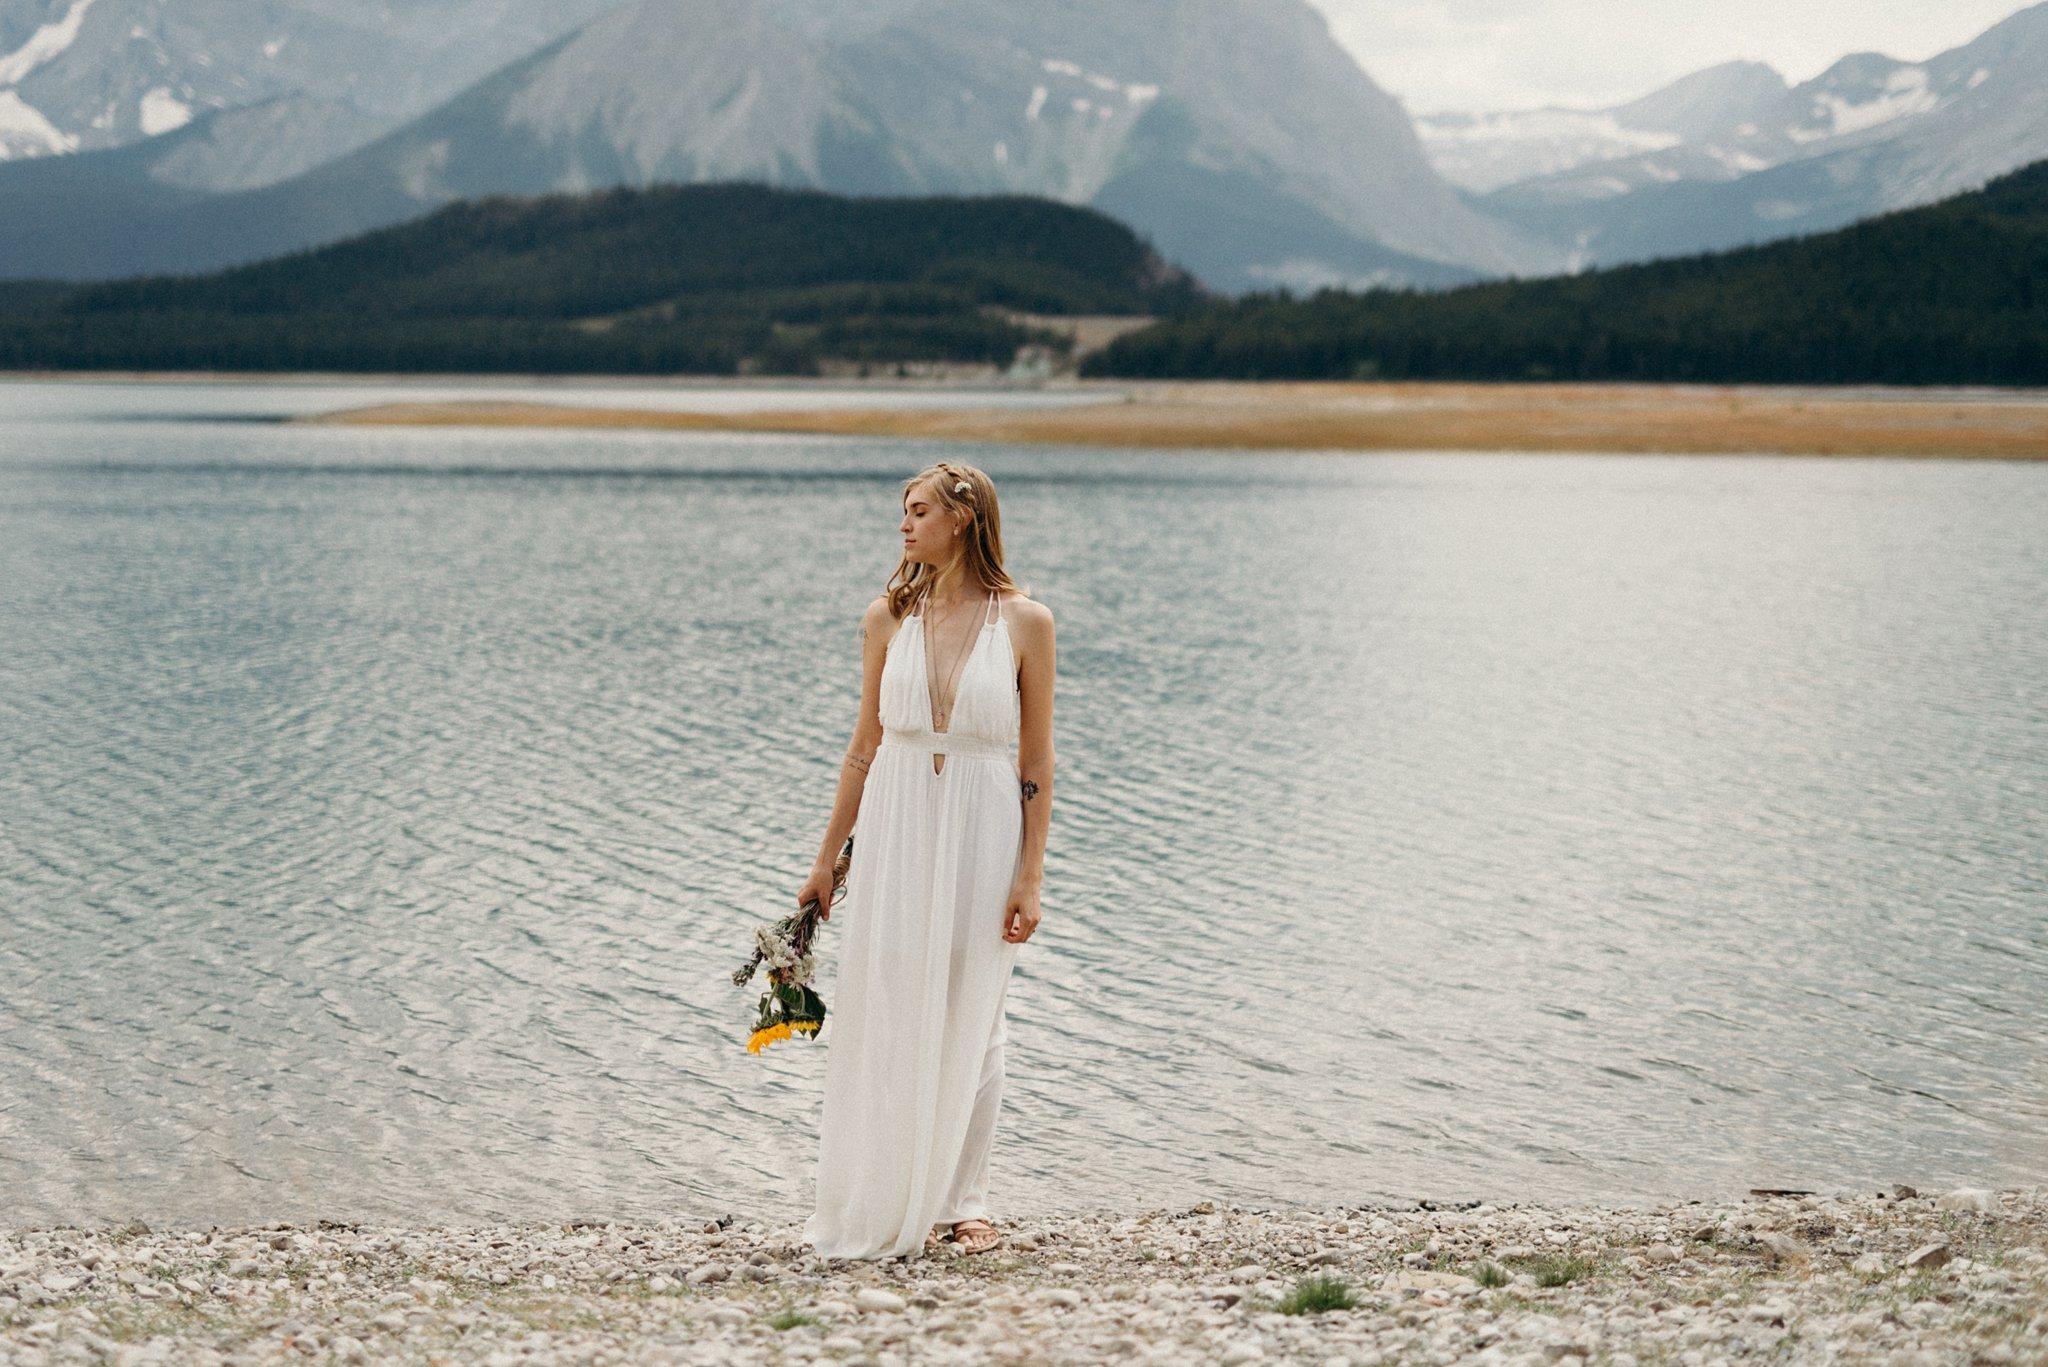 kaihla_tonai_intimate_wedding_elopement_photographer_6405.jpg